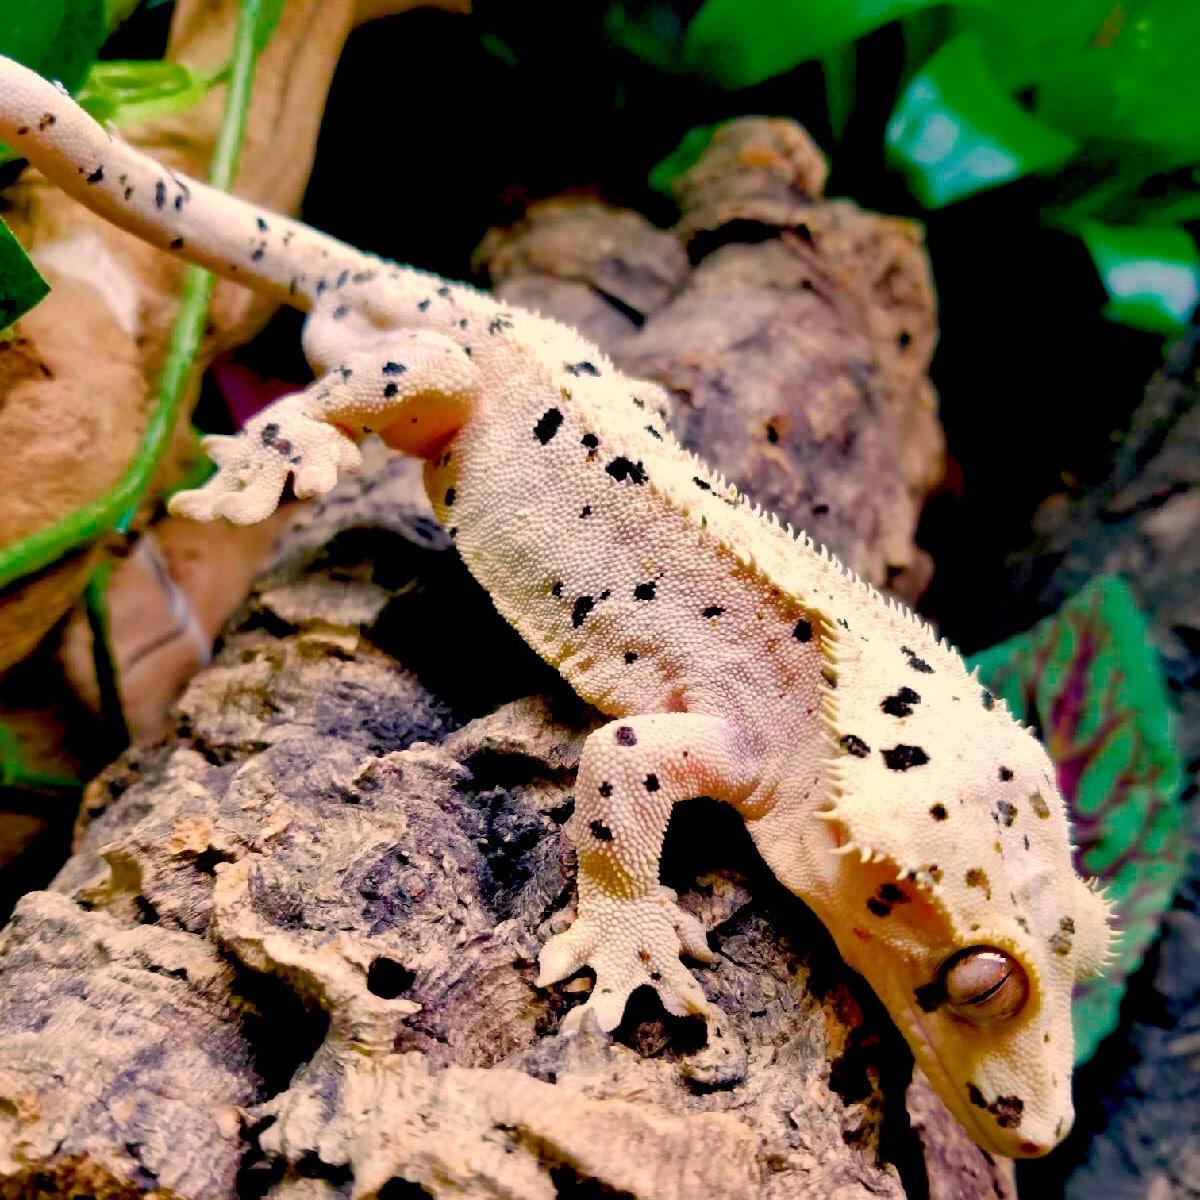 Super Dalmatian Crested gecko for sale